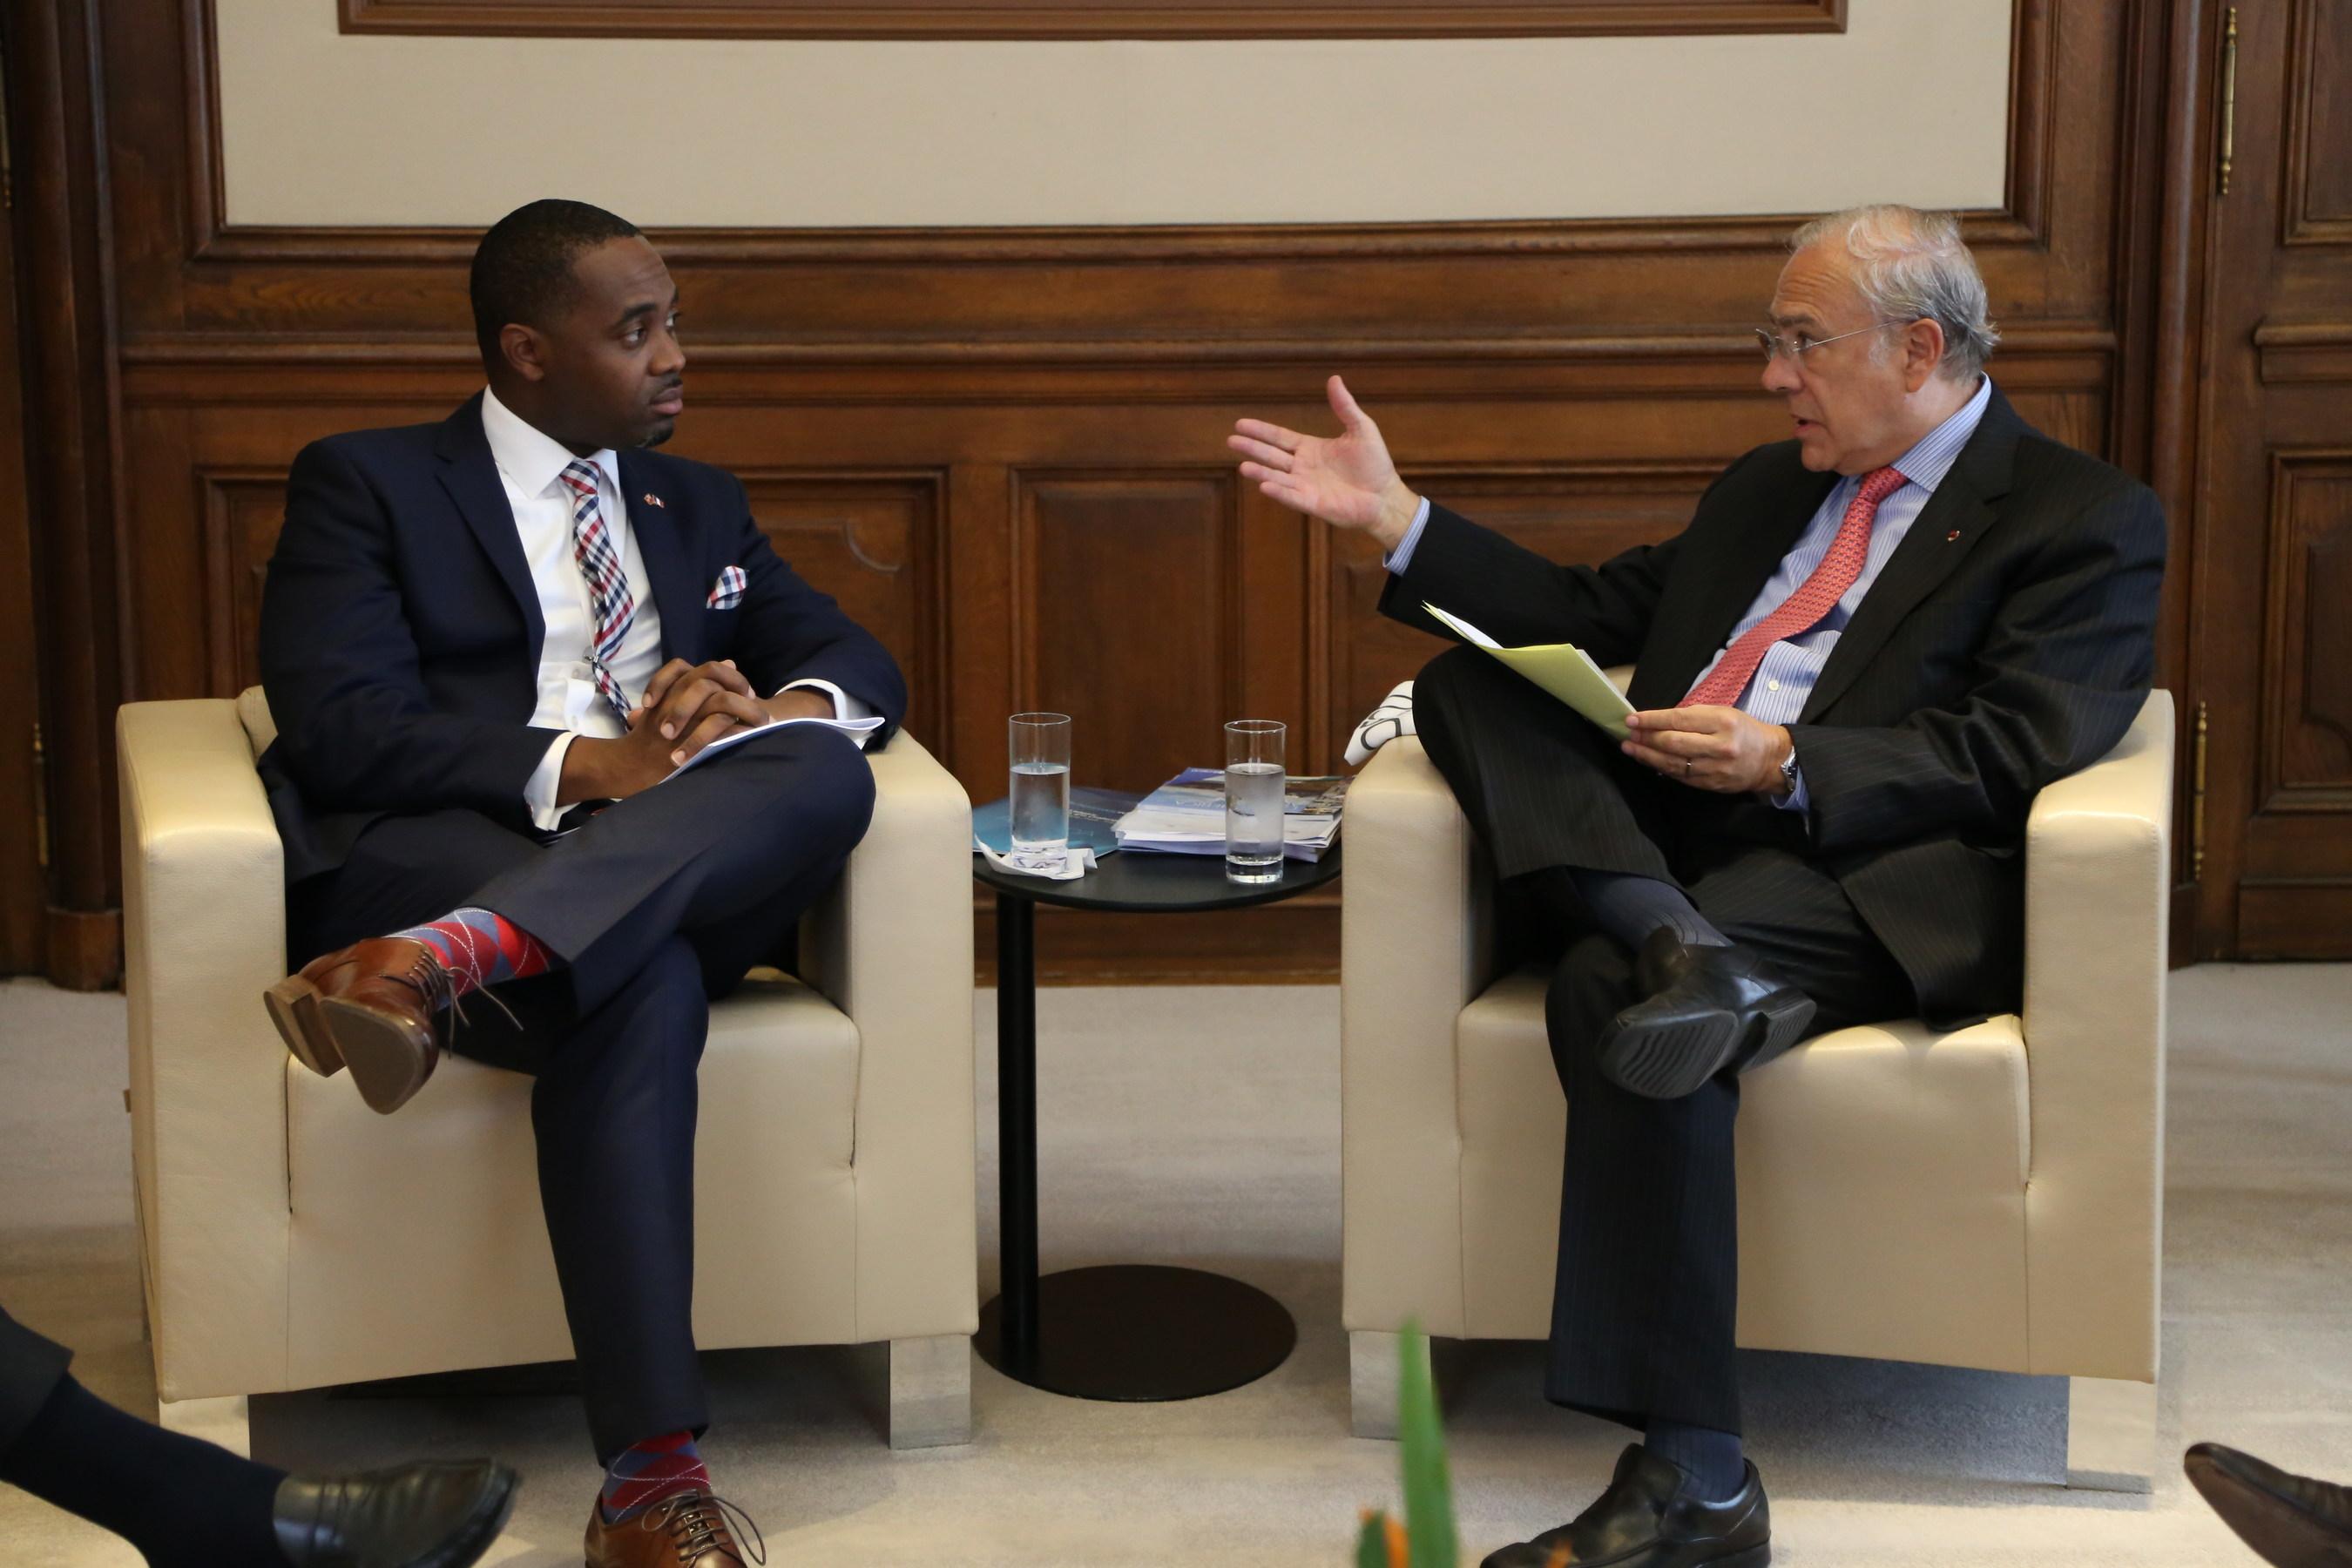 The Premier of Bermuda, The Hon David Burt JP, MP, and Director General Angel Arrugía on September 4 in Paris. (PRNewsfoto/Government of Bermuda)